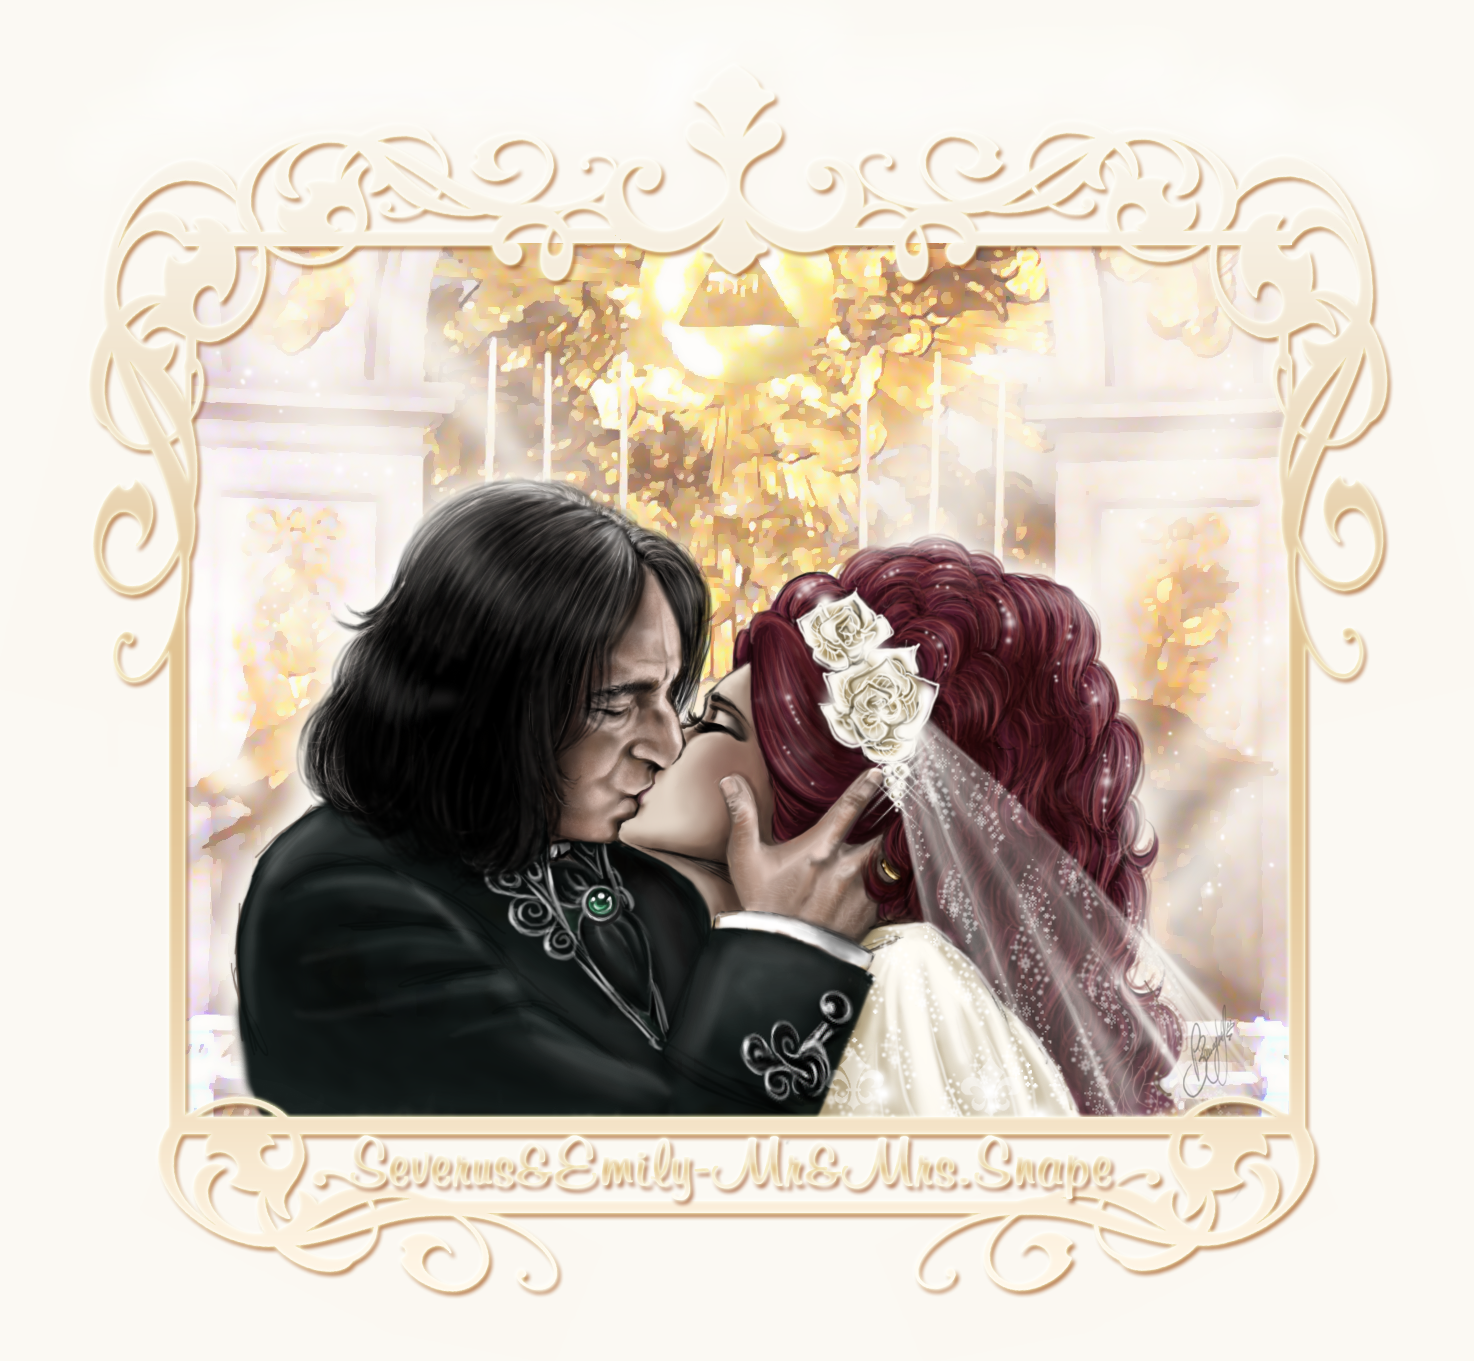 Alan Rickman secretly marries Emily-Severus-Wedding-Kiss-severus-snape-and-original-female-characters-26711092-1474-1361